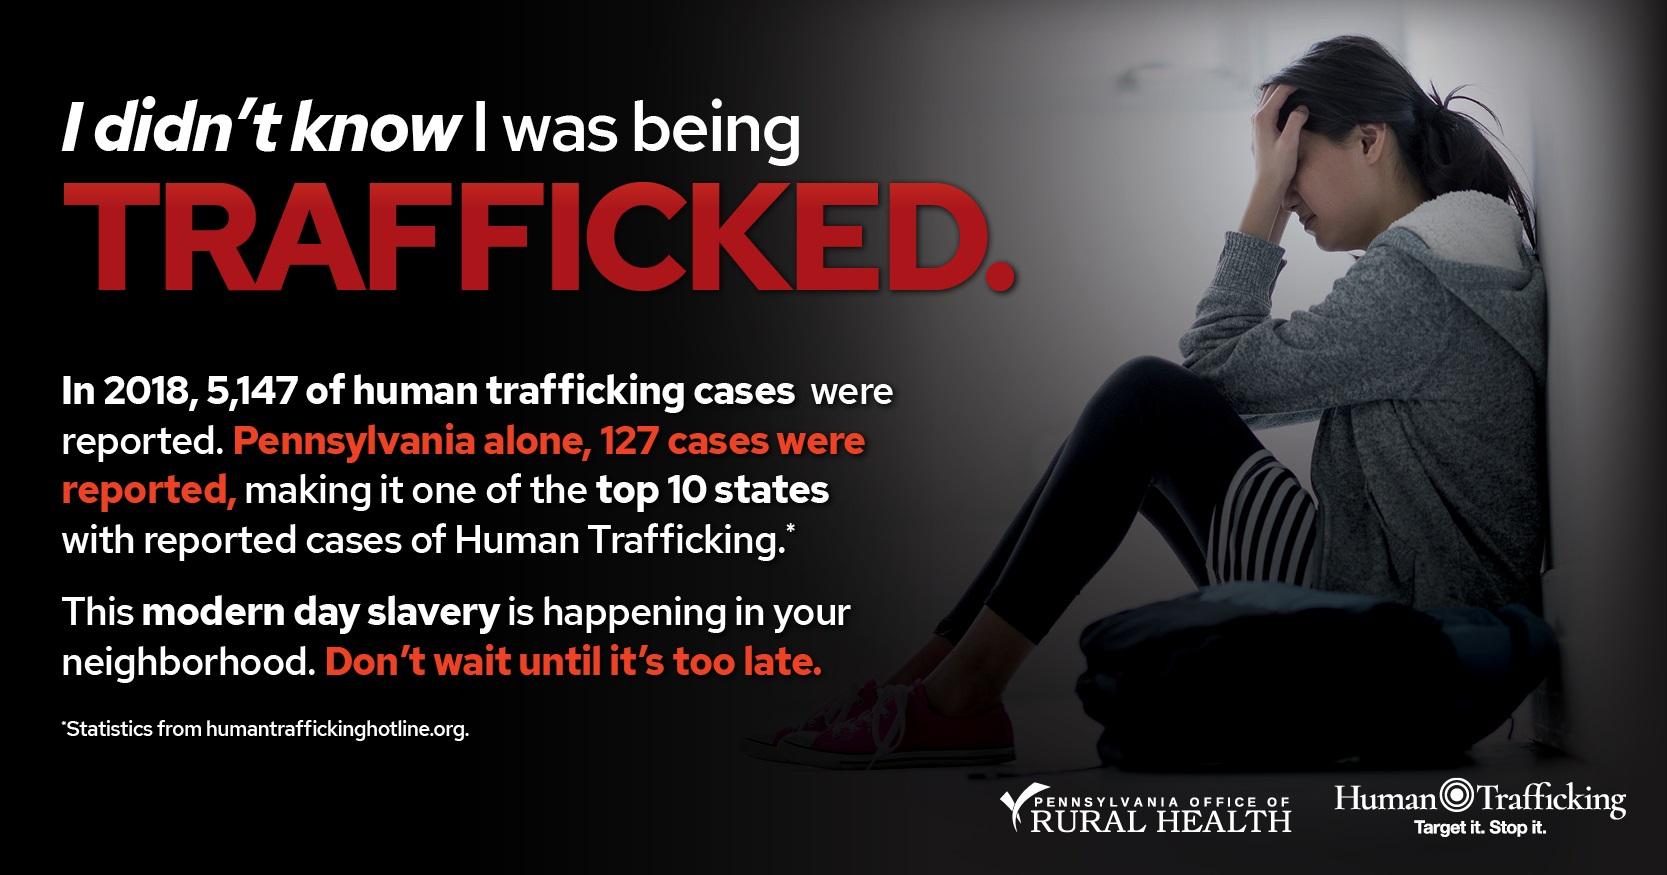 2019 Rural Human Trafficking Summit | Pennsylvania Office of Rural Health